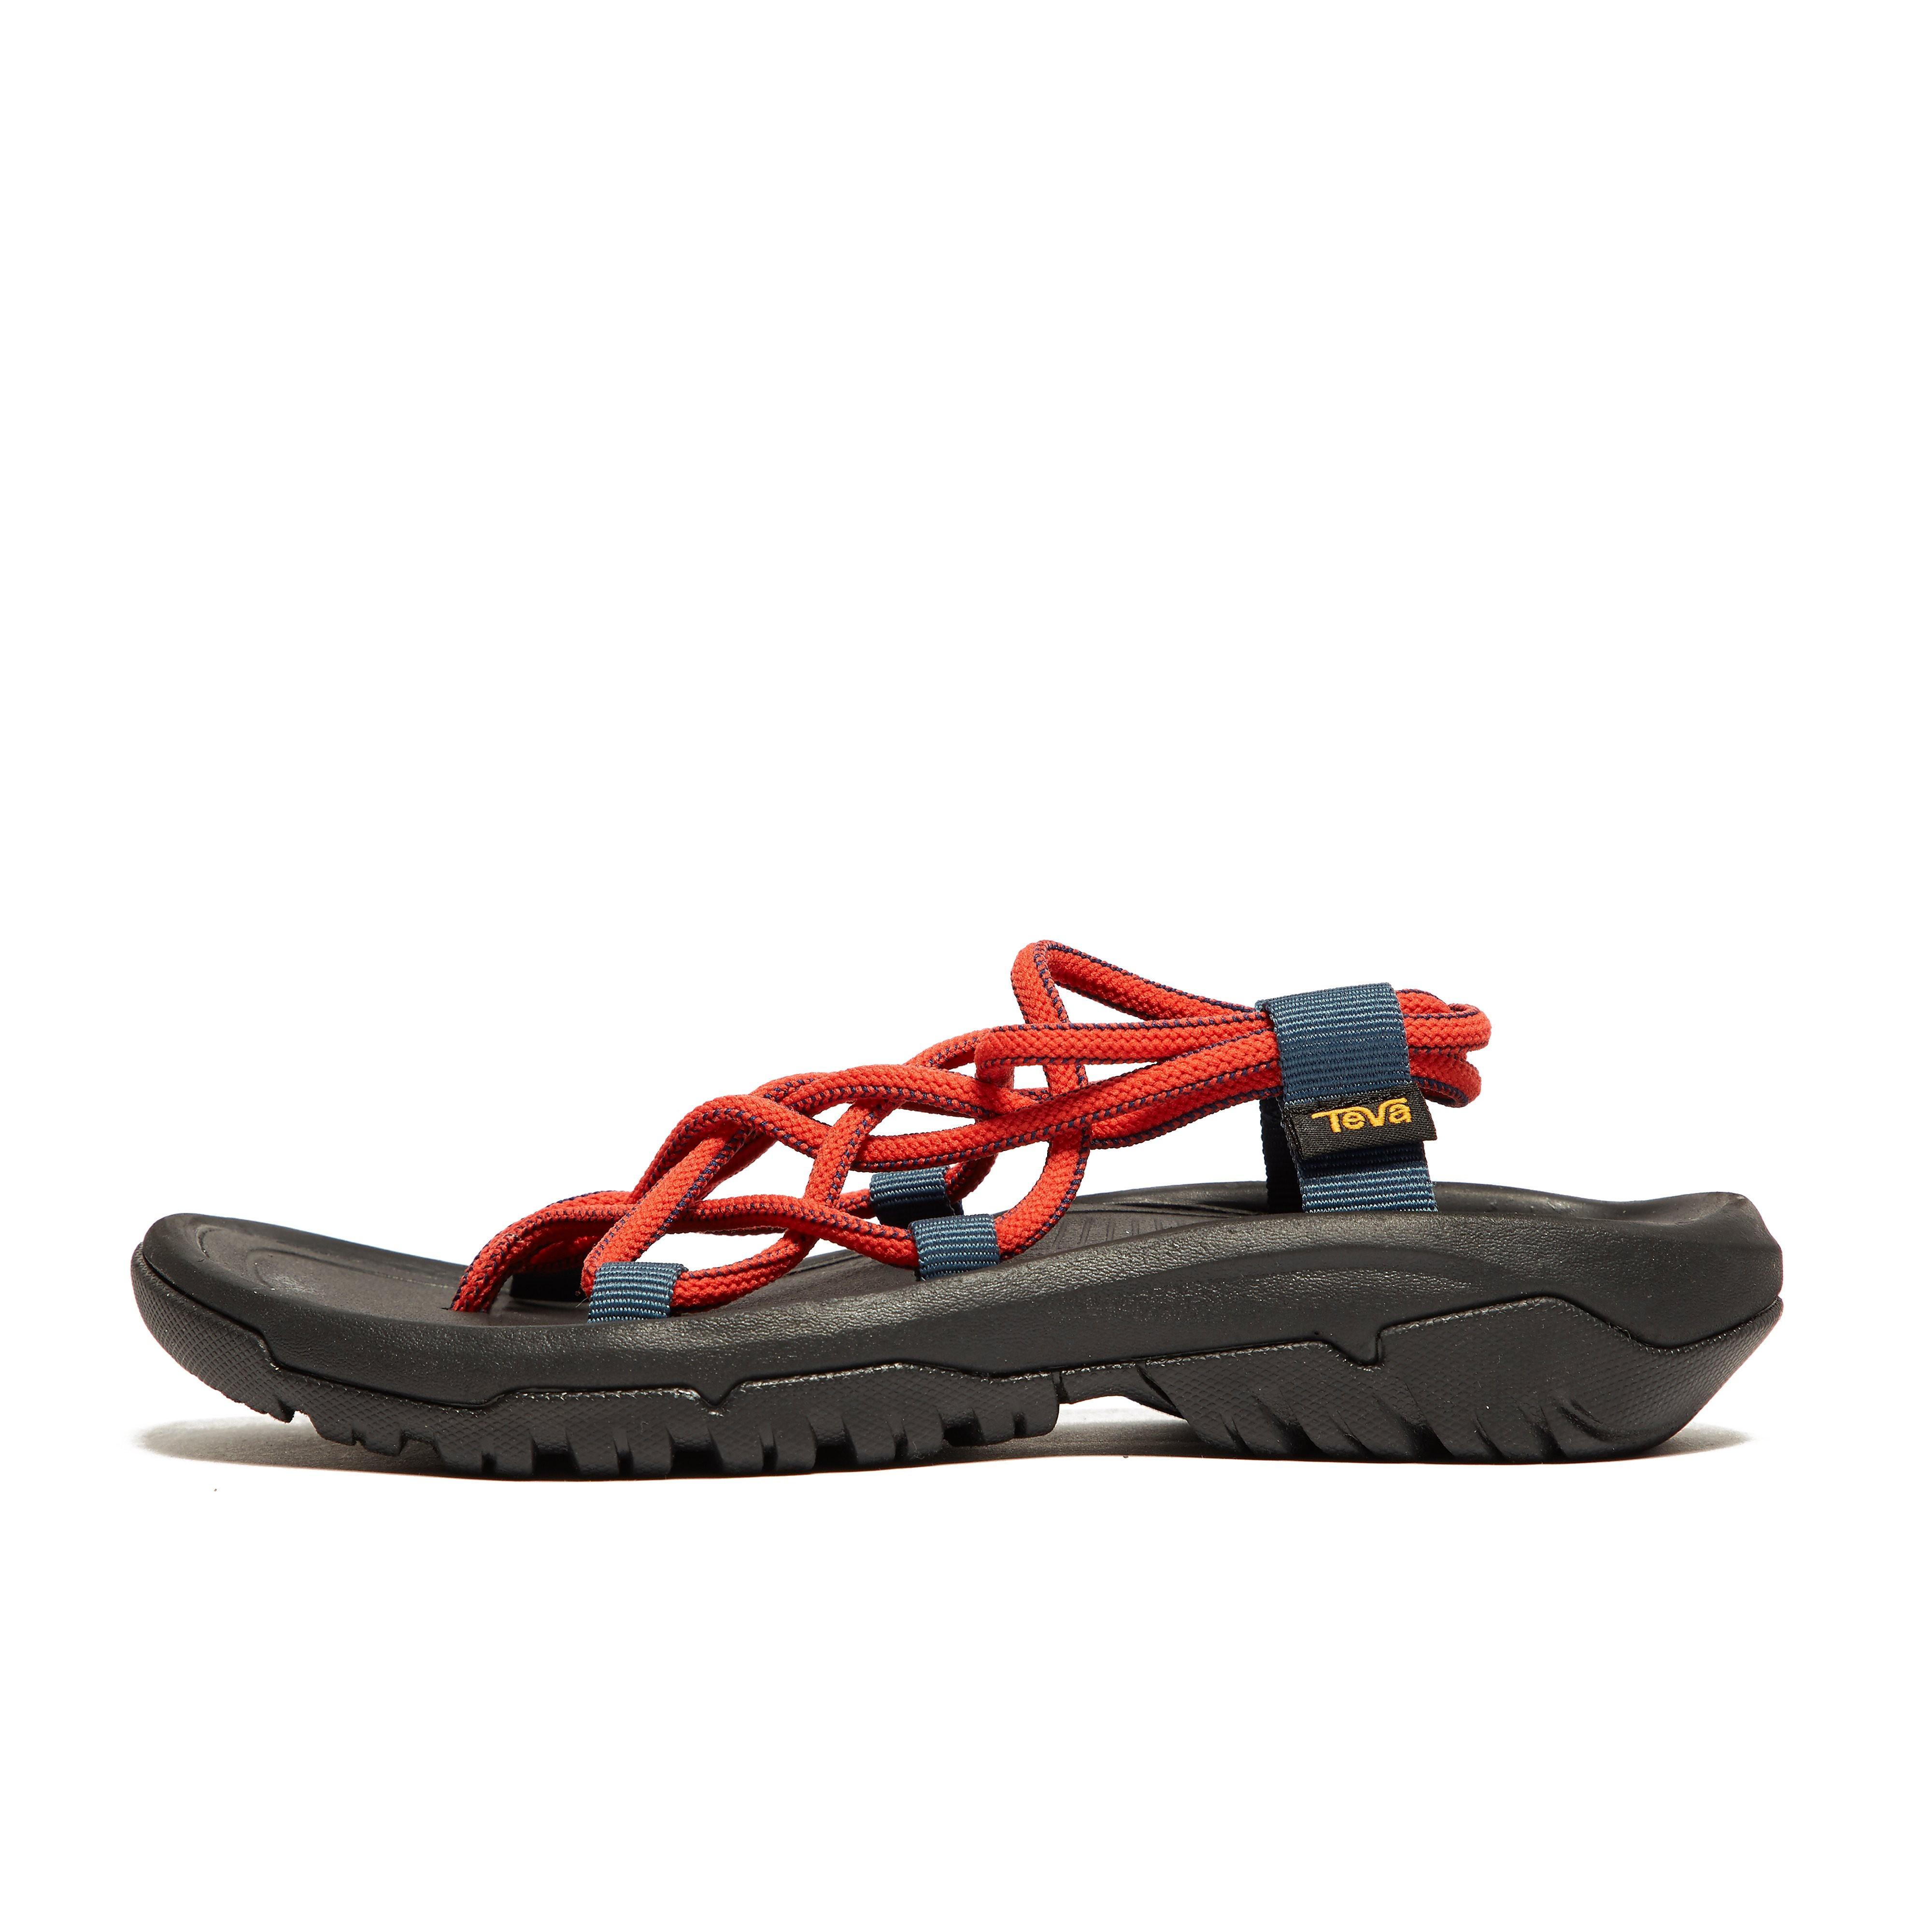 Teva Hurricane XLT Infinity Women's Walking Sandals